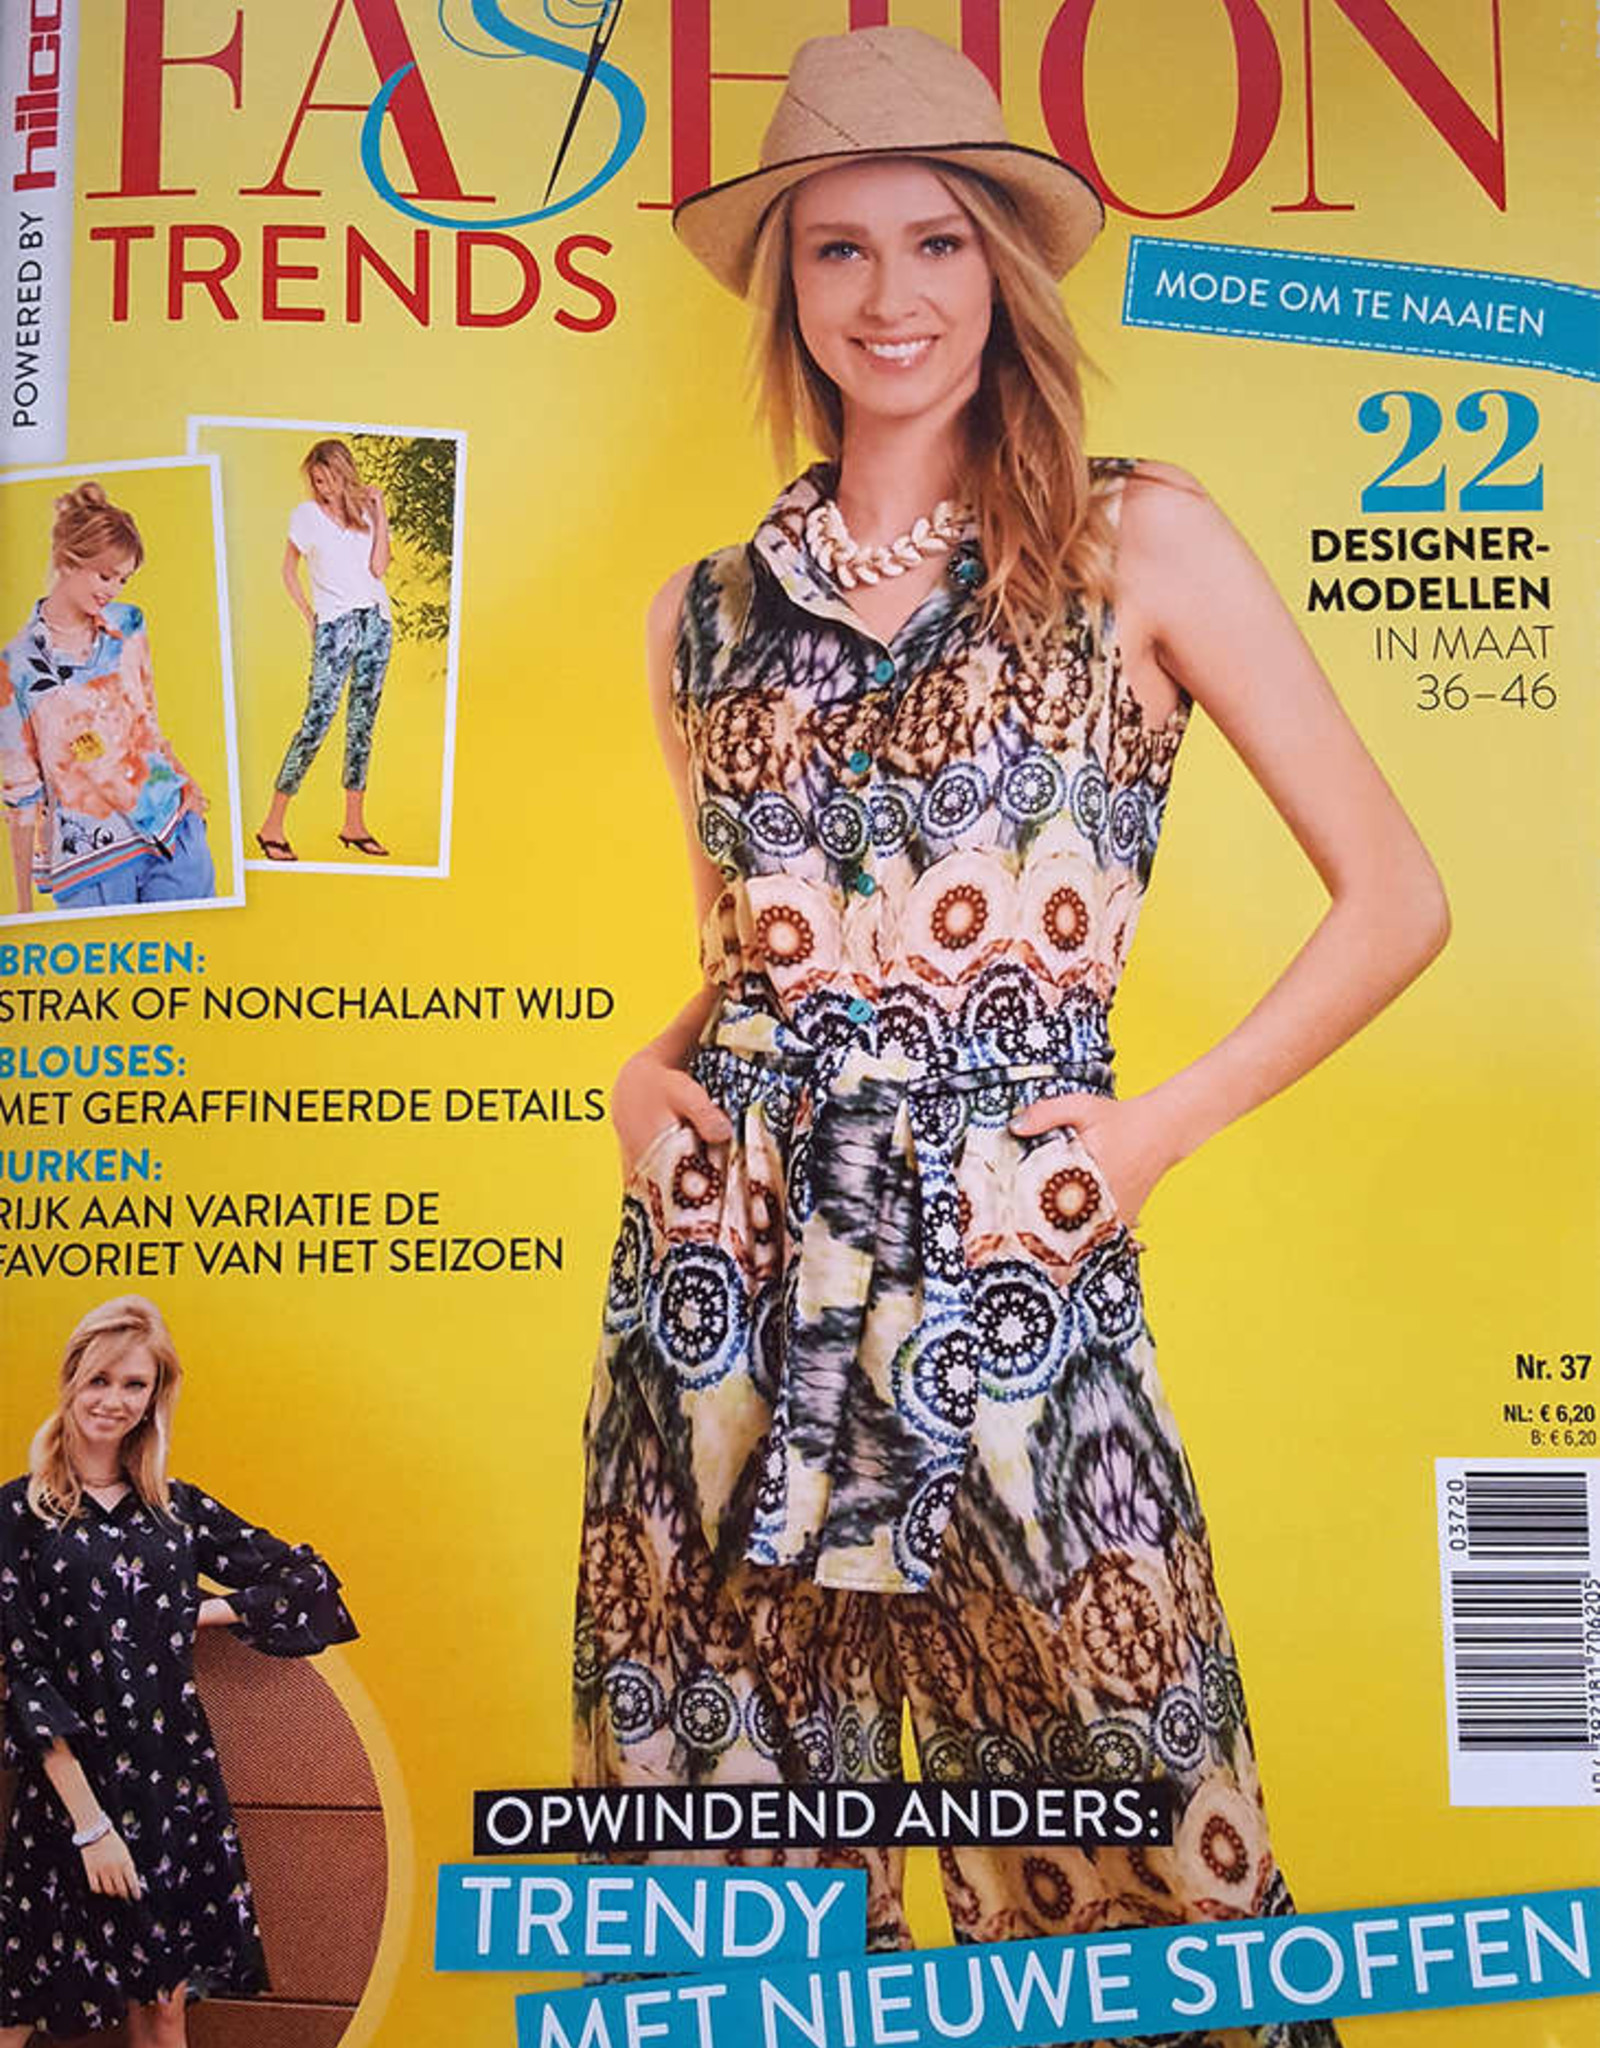 Hilco Fashion Trends by Hilco nr 37 - naaimagazine